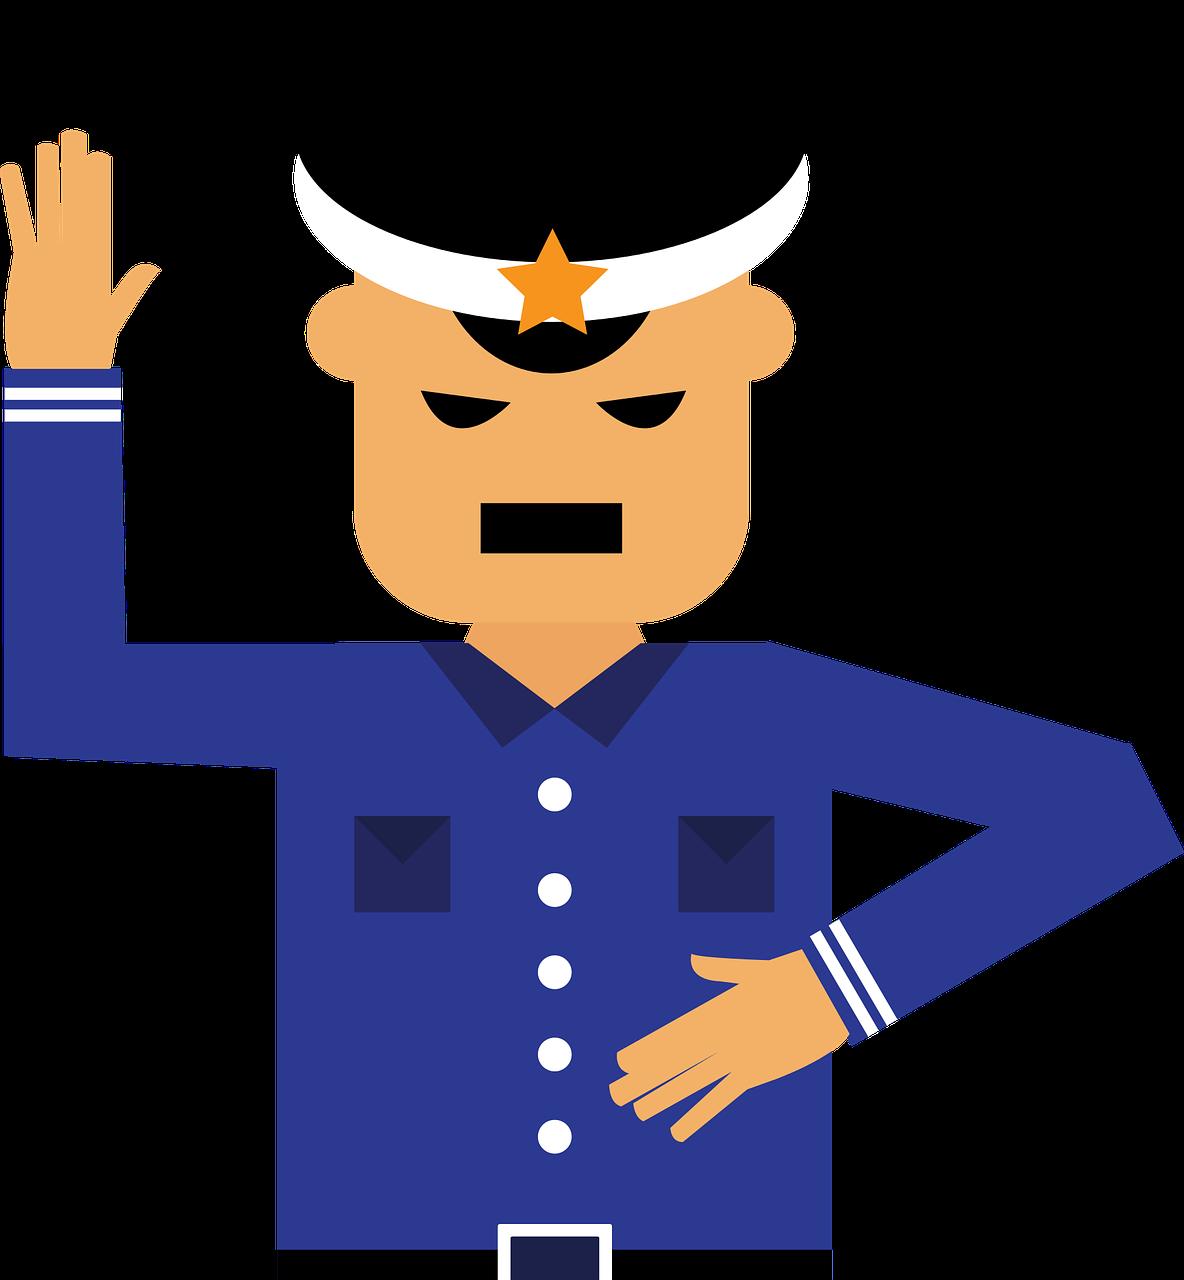 Lady clipart security guard. Services advanced fms mumbai